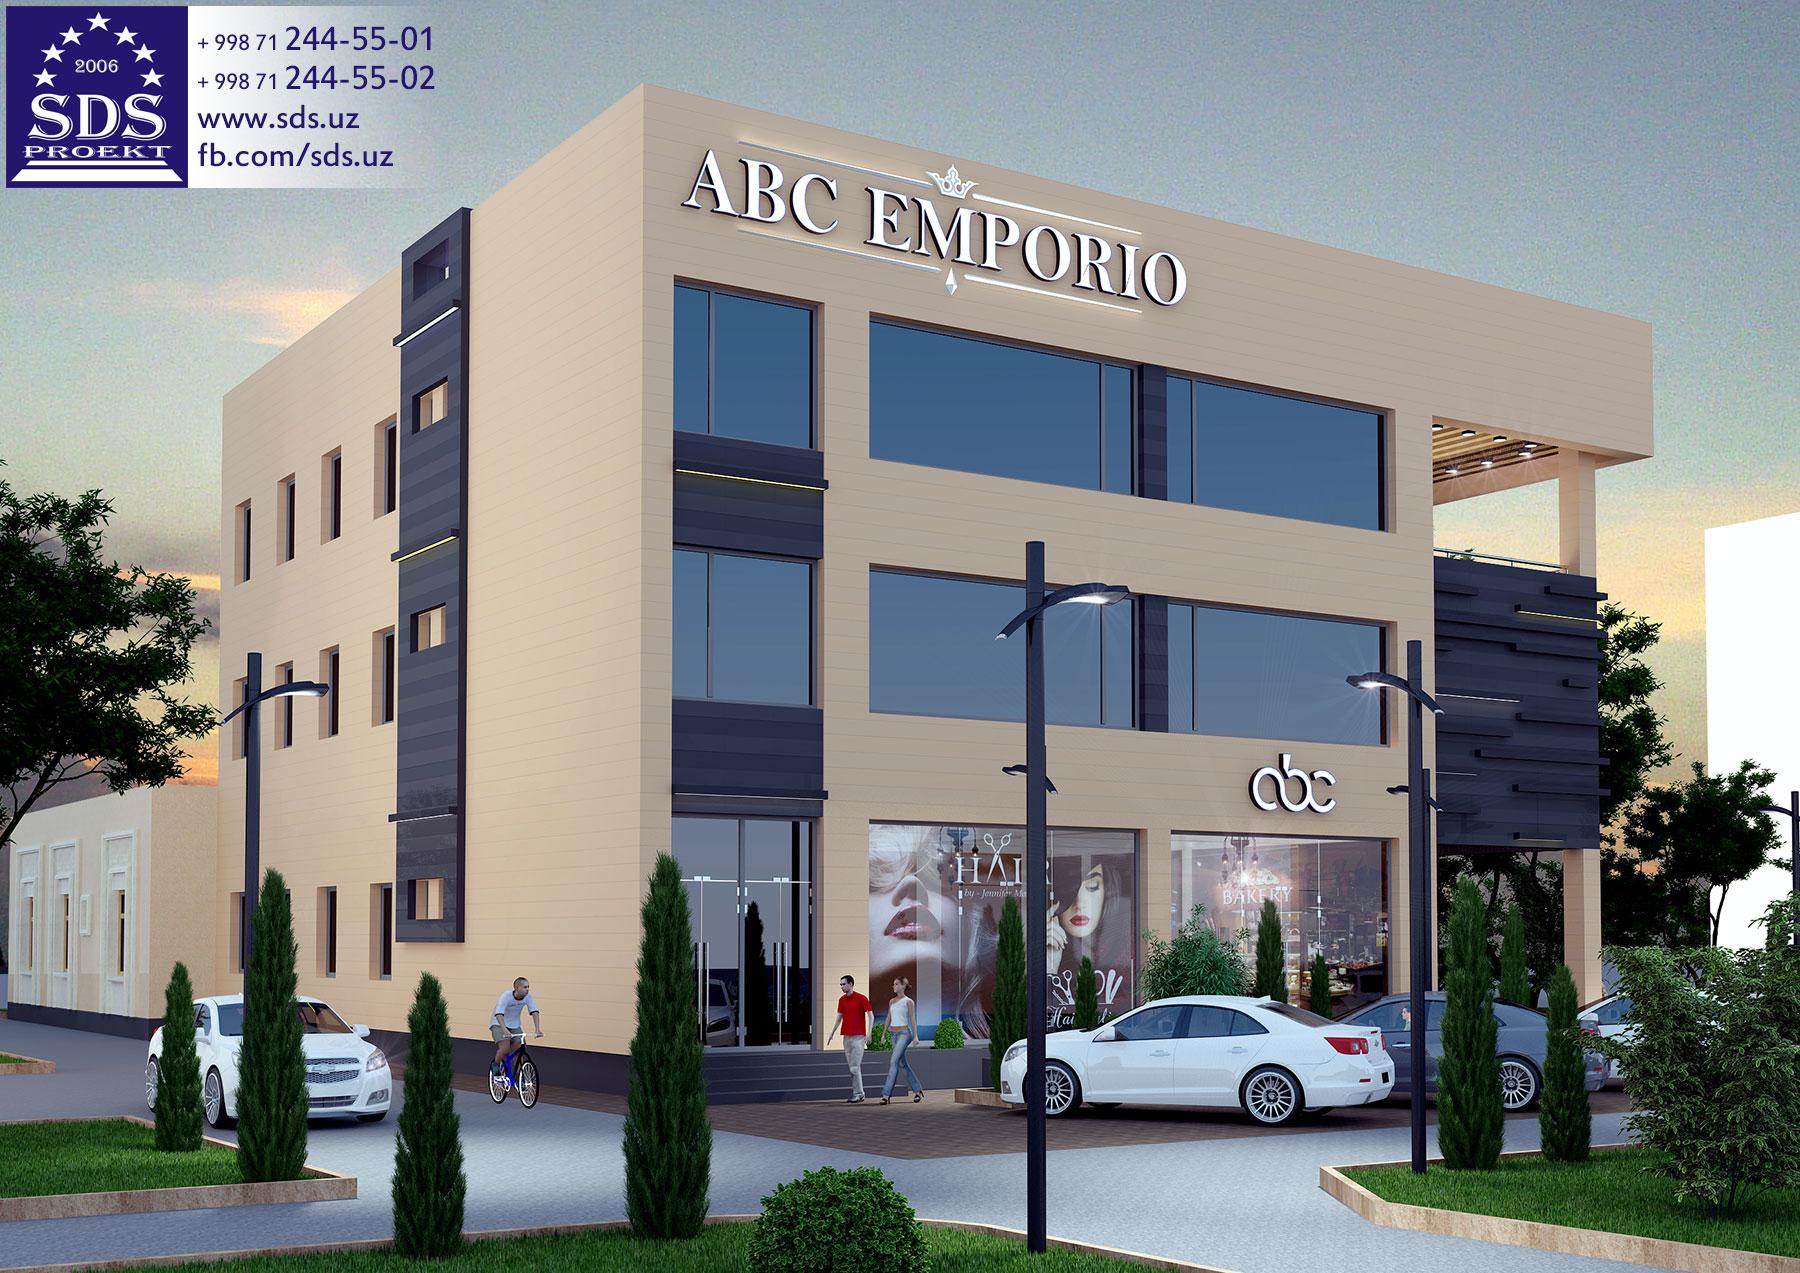 Проект трехэтажного бизнес центра